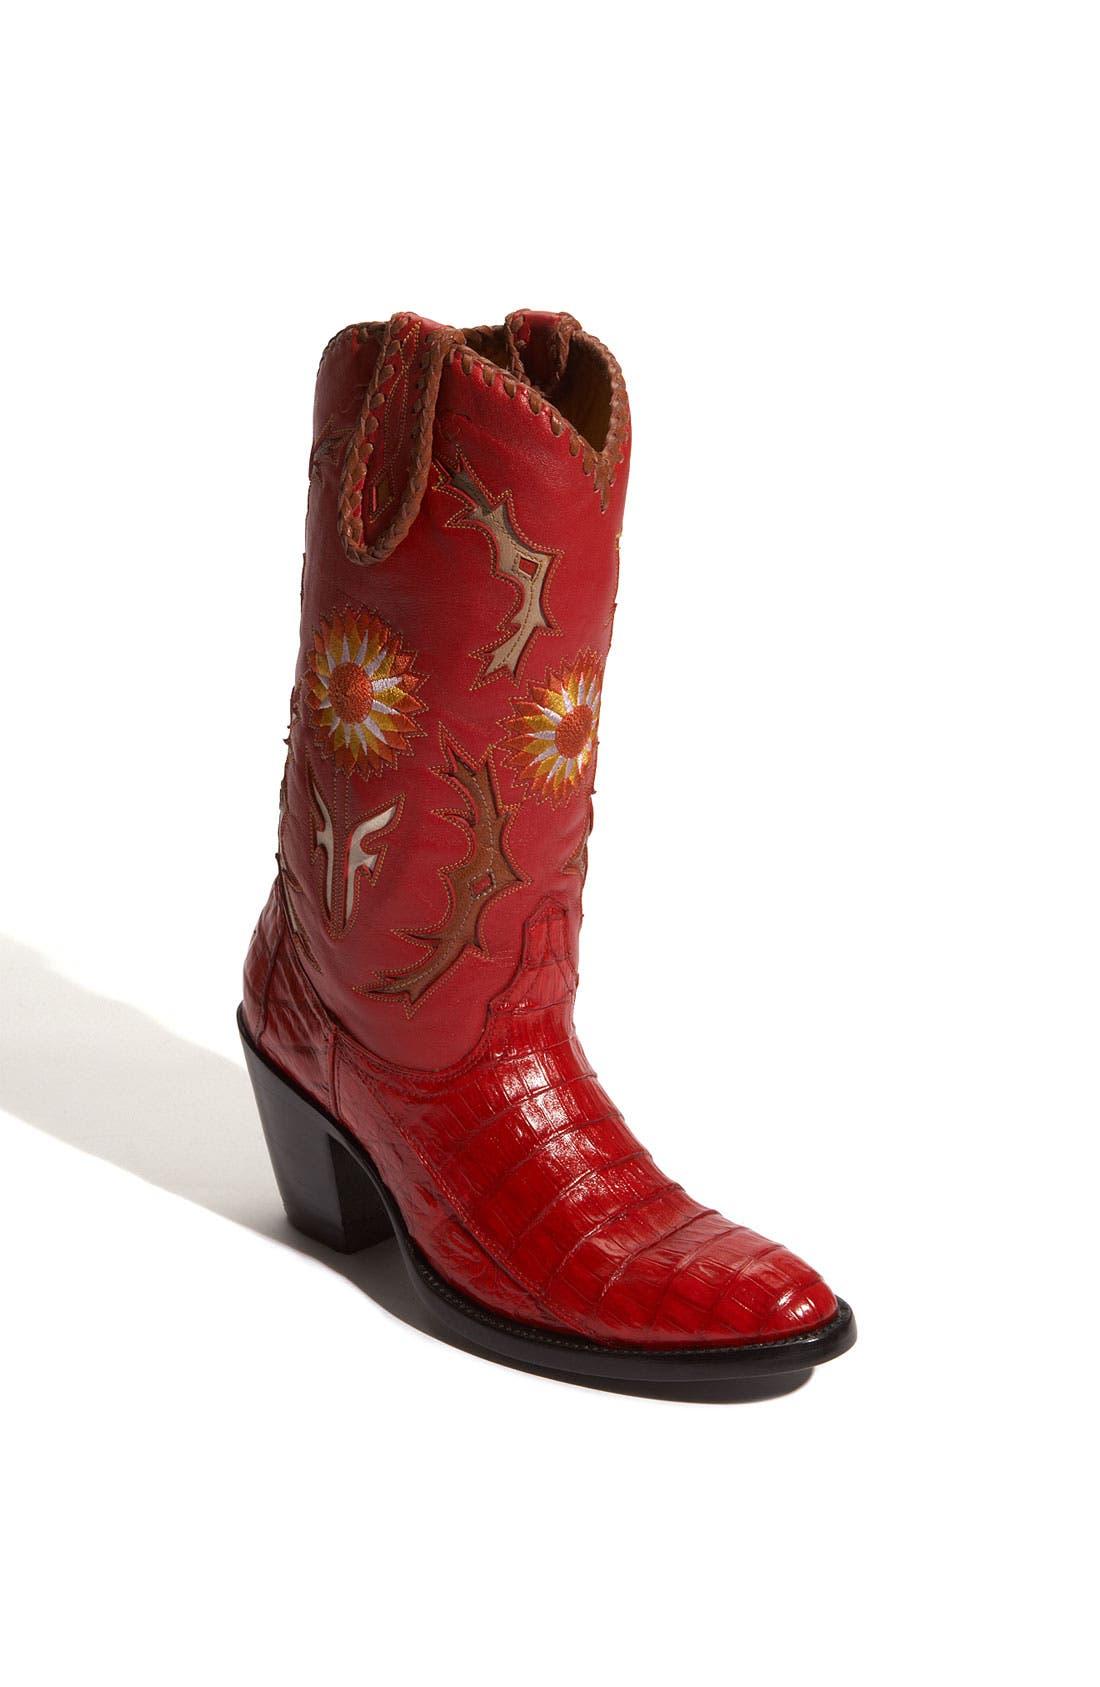 Alternate Image 1 Selected - Frye 'Hope' Boot